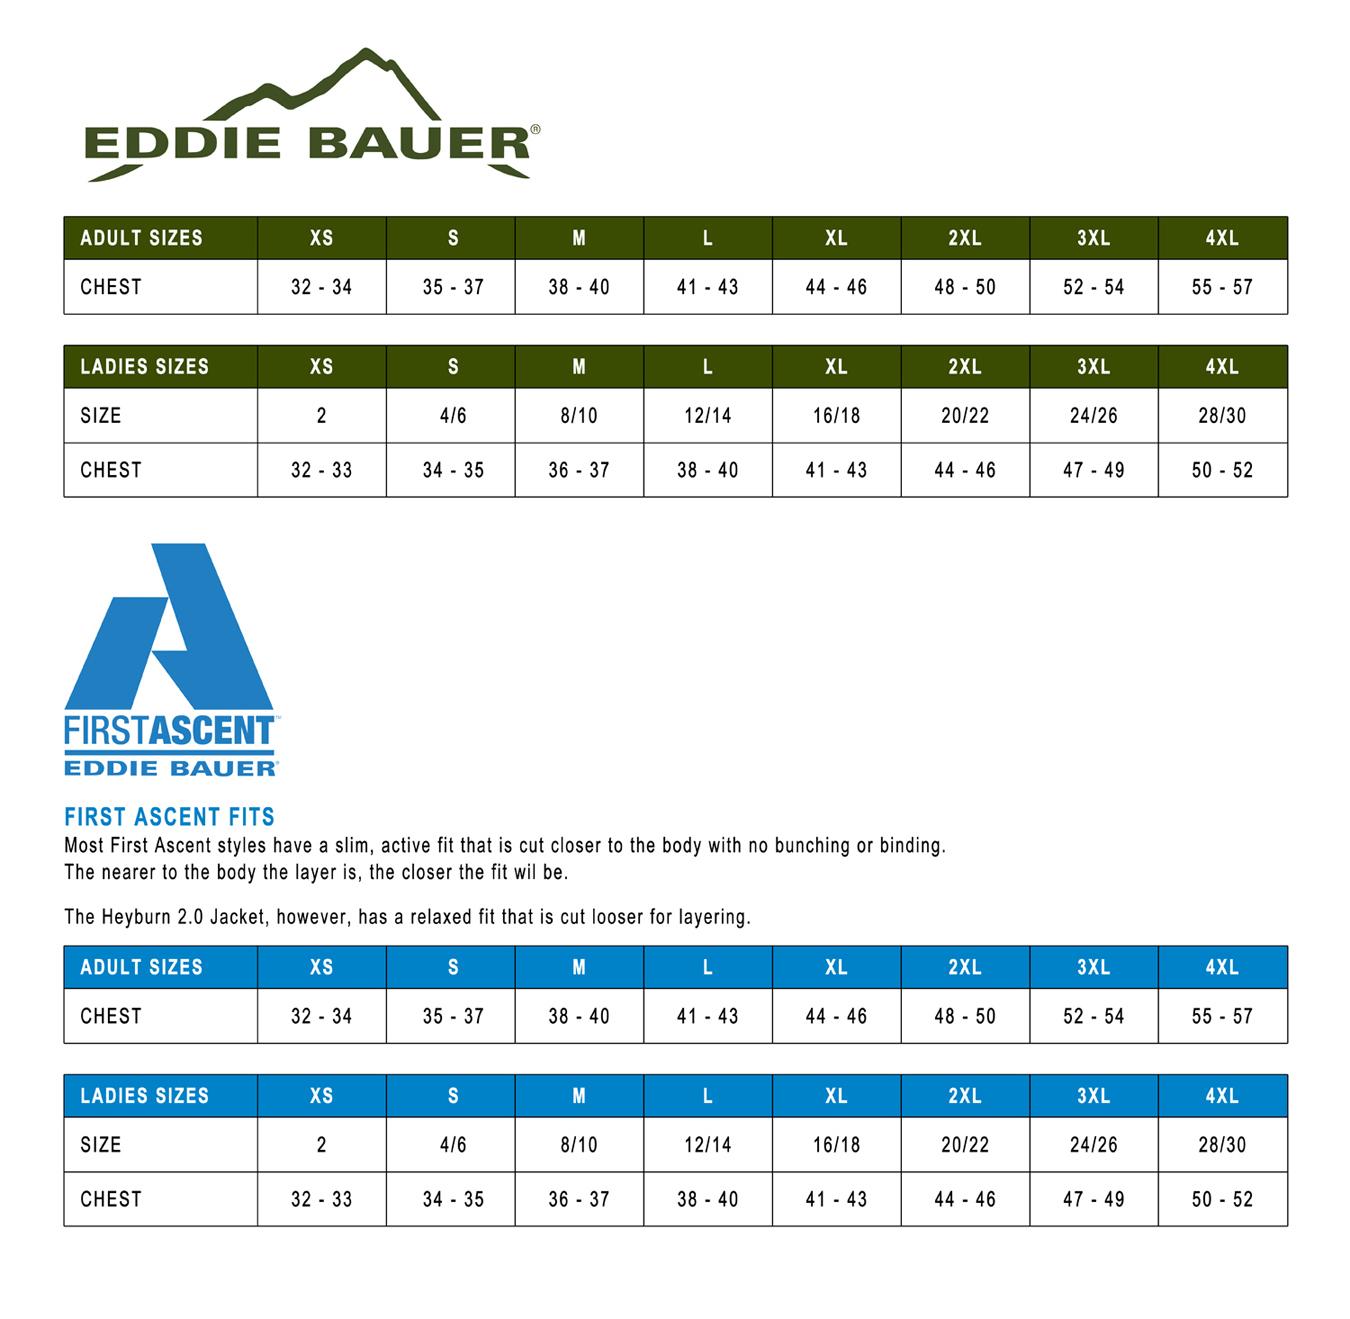 Eddie bauer first ascent sizing chart